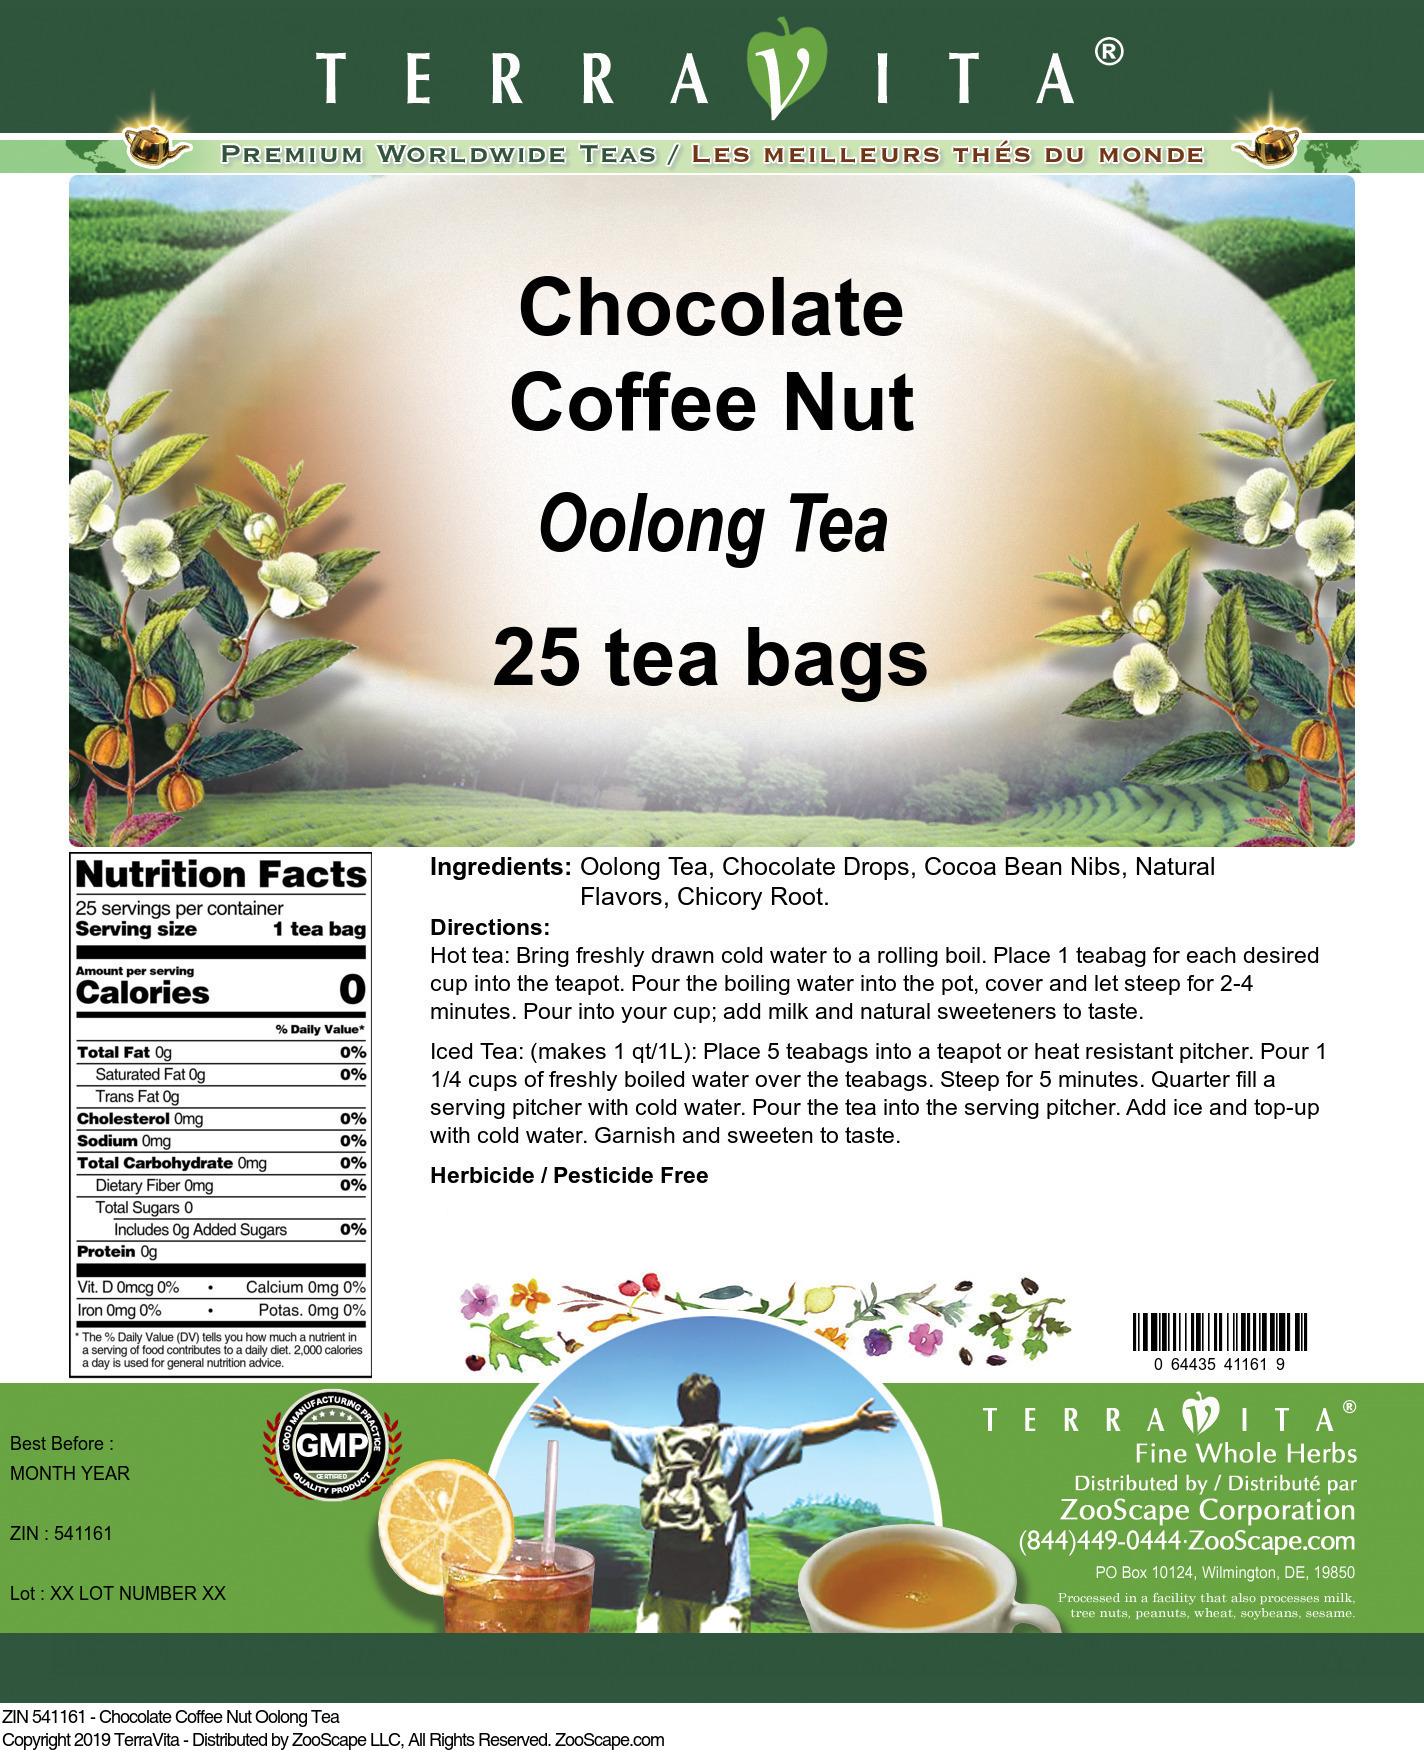 Chocolate Coffee Nut Oolong Tea